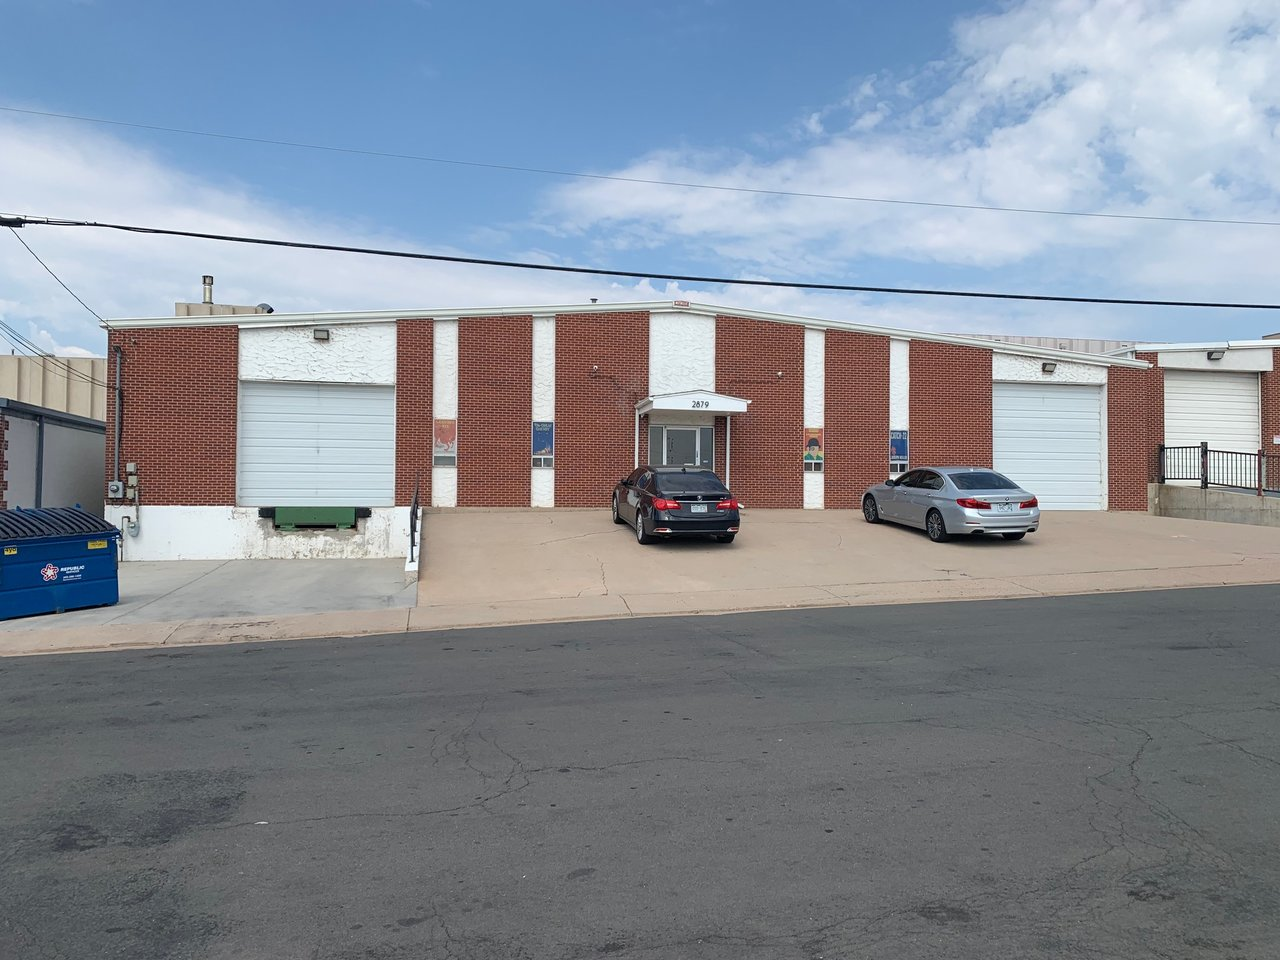 2879 S Shoshone St, Englewood, CO, 80110